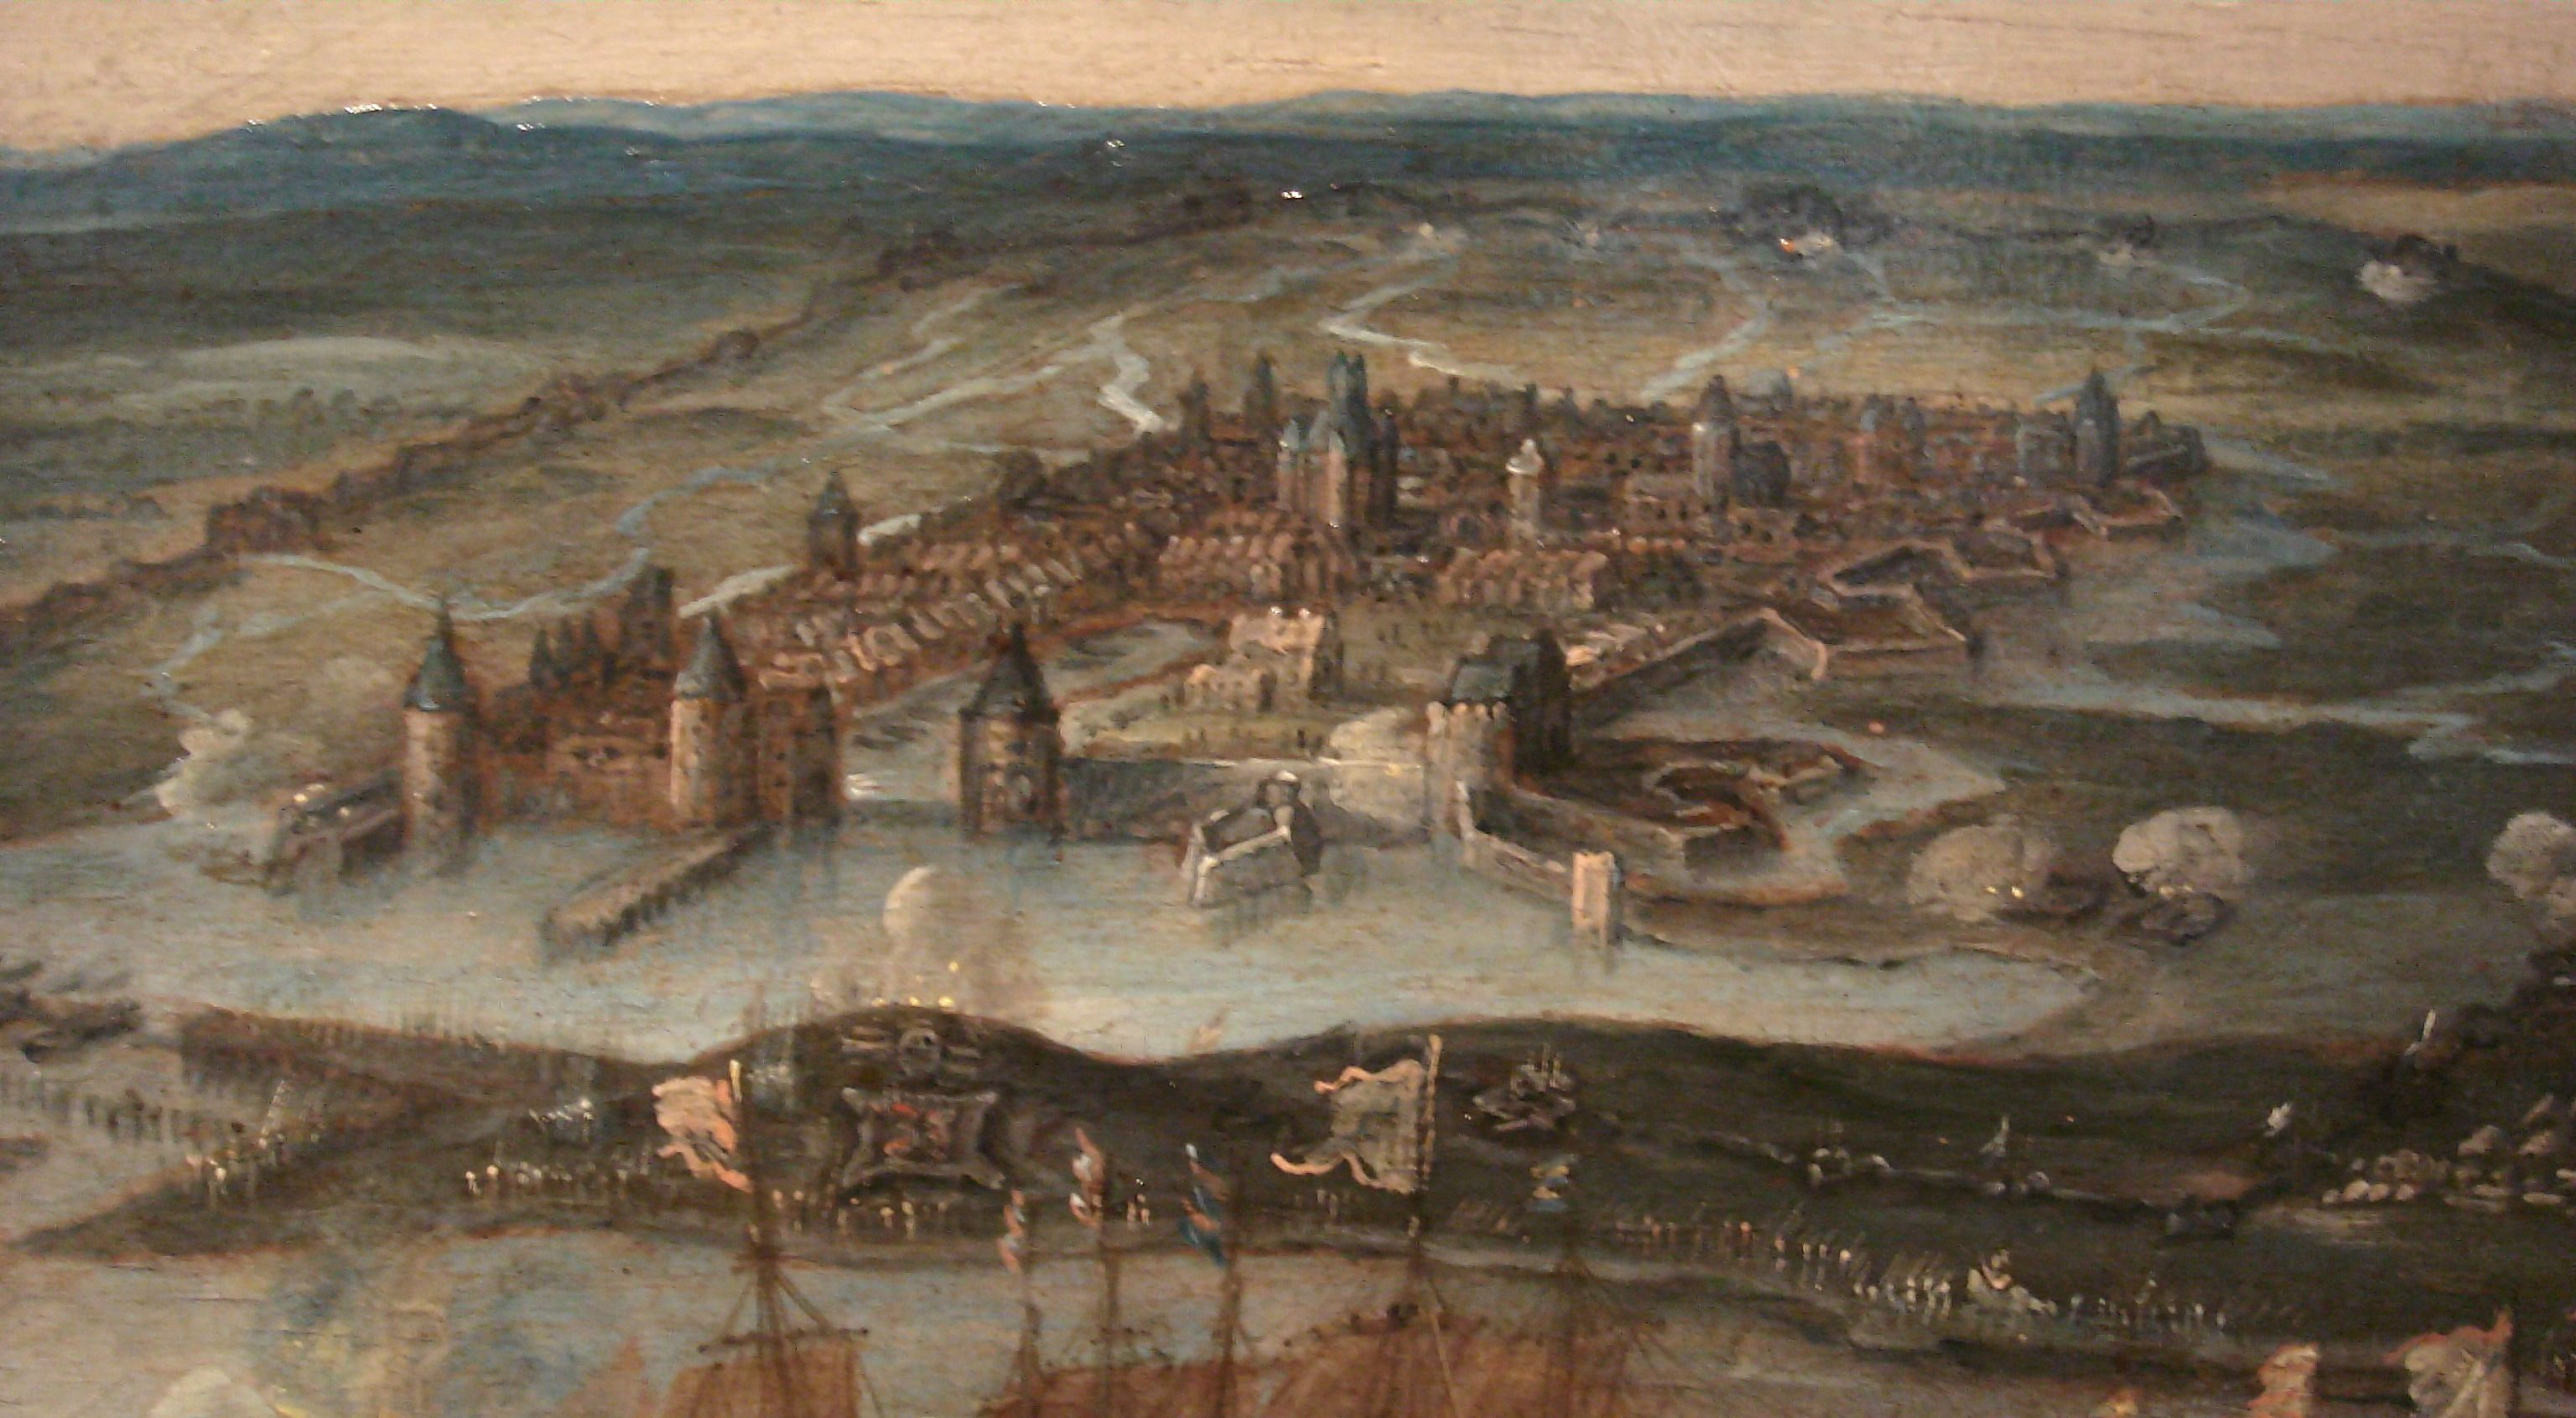 la_rochelle_during_the_1628_siege.jpg